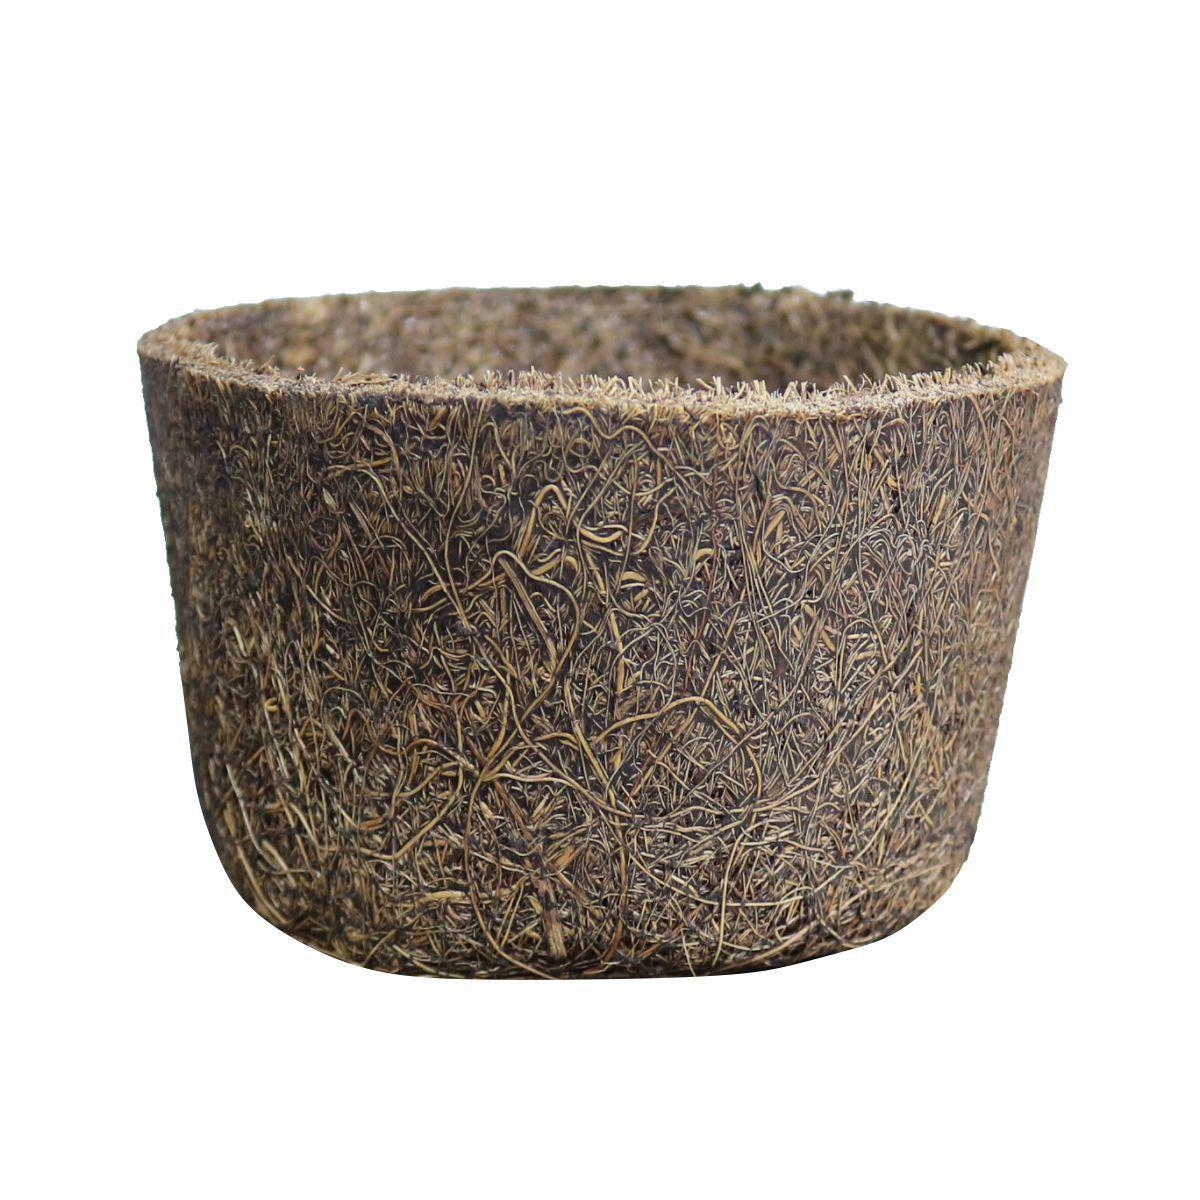 Vaso de Fibra de Coco Nº 04 10cm x 6cm COQUIM